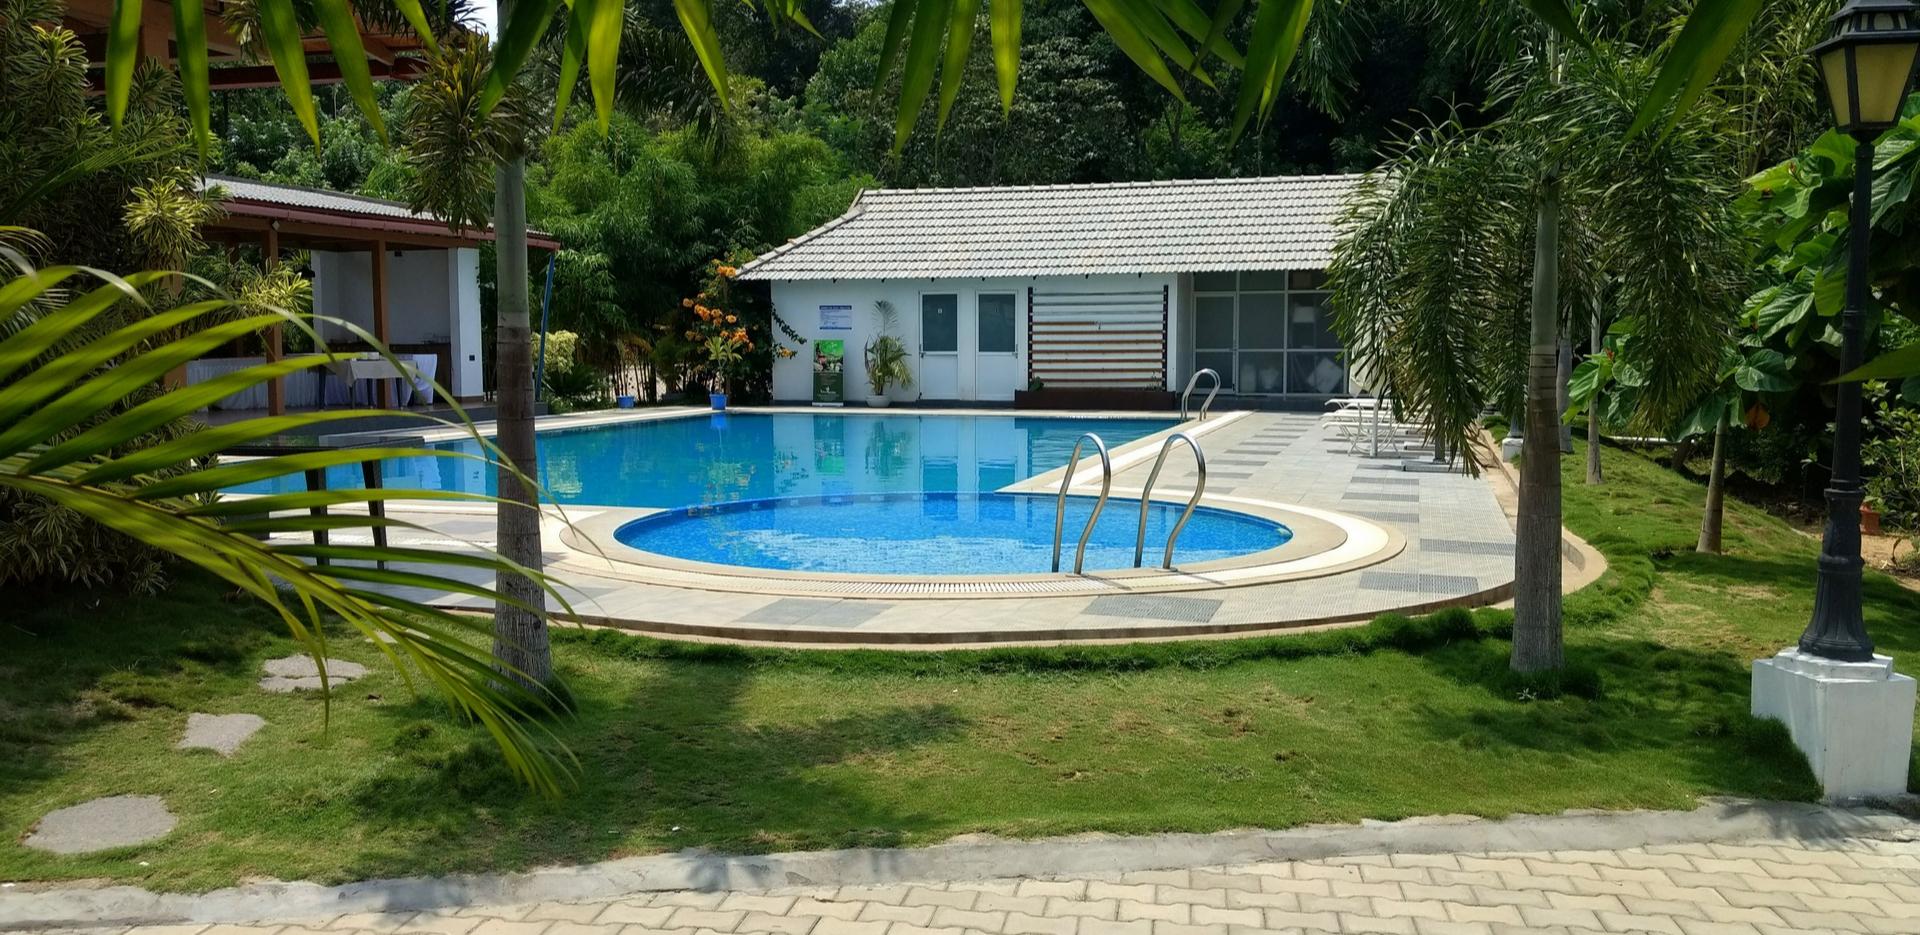 Club Mahindra coorg resort